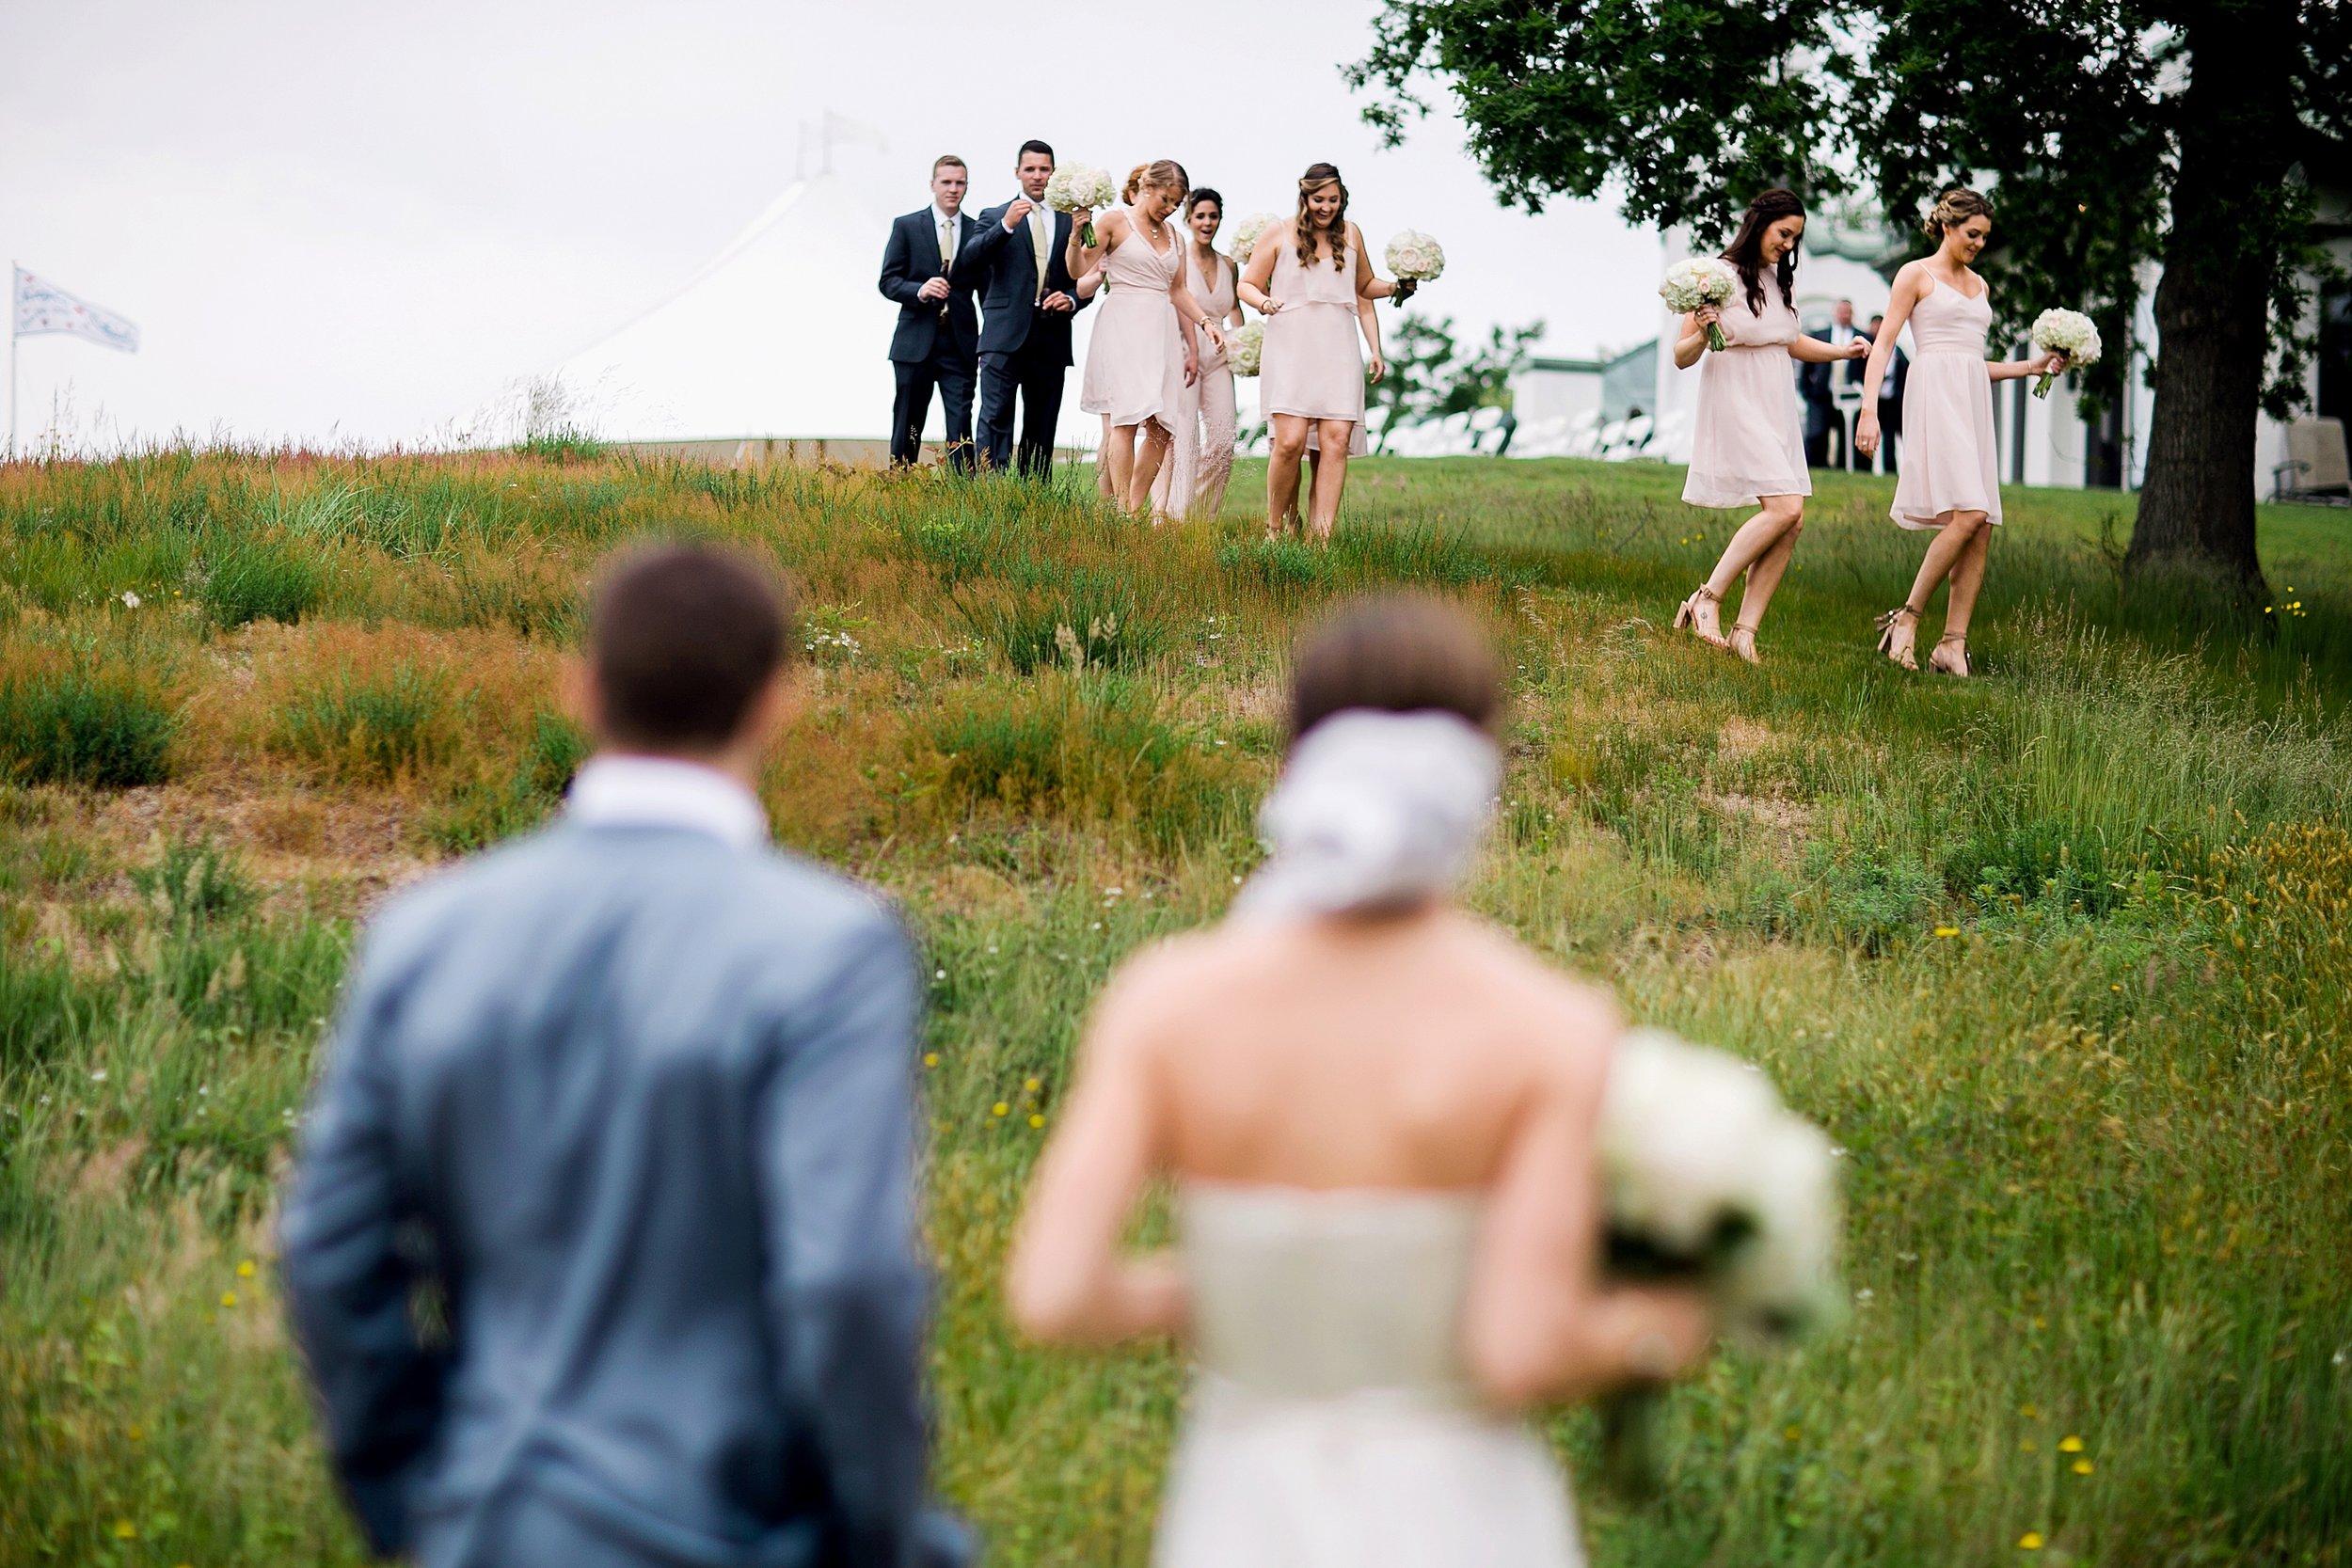 024 los angeles wedding photographer todd danforth photography cape cod.jpg